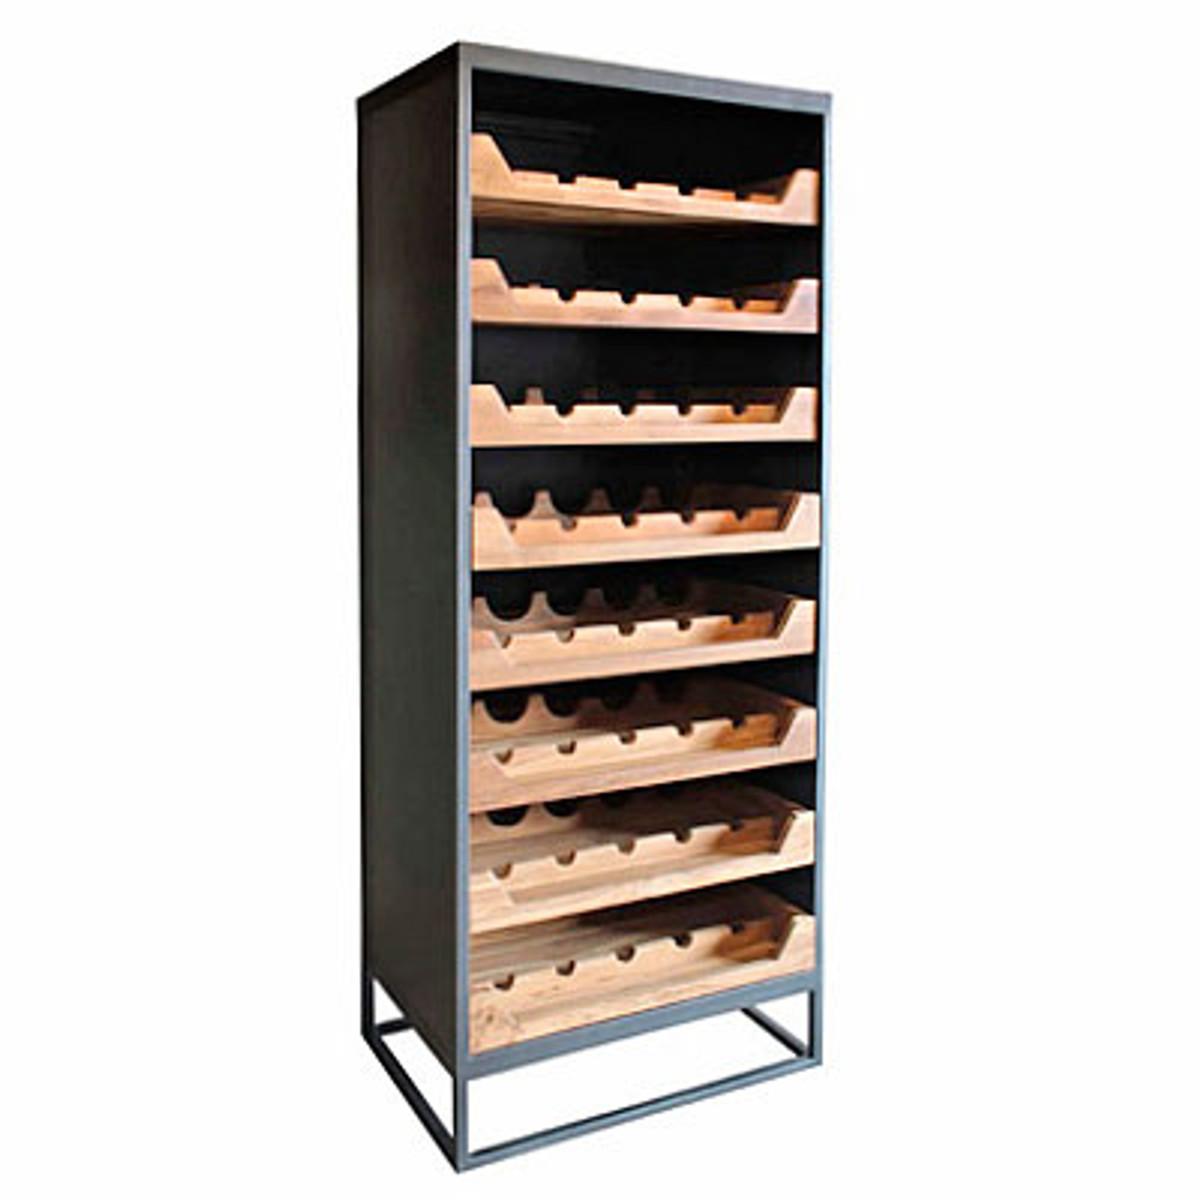 Casa Padrino Industrial Look Weinschrank 67x45x183cm Metall Holz Weinregal Kaufen Bei Demotex Gmbh